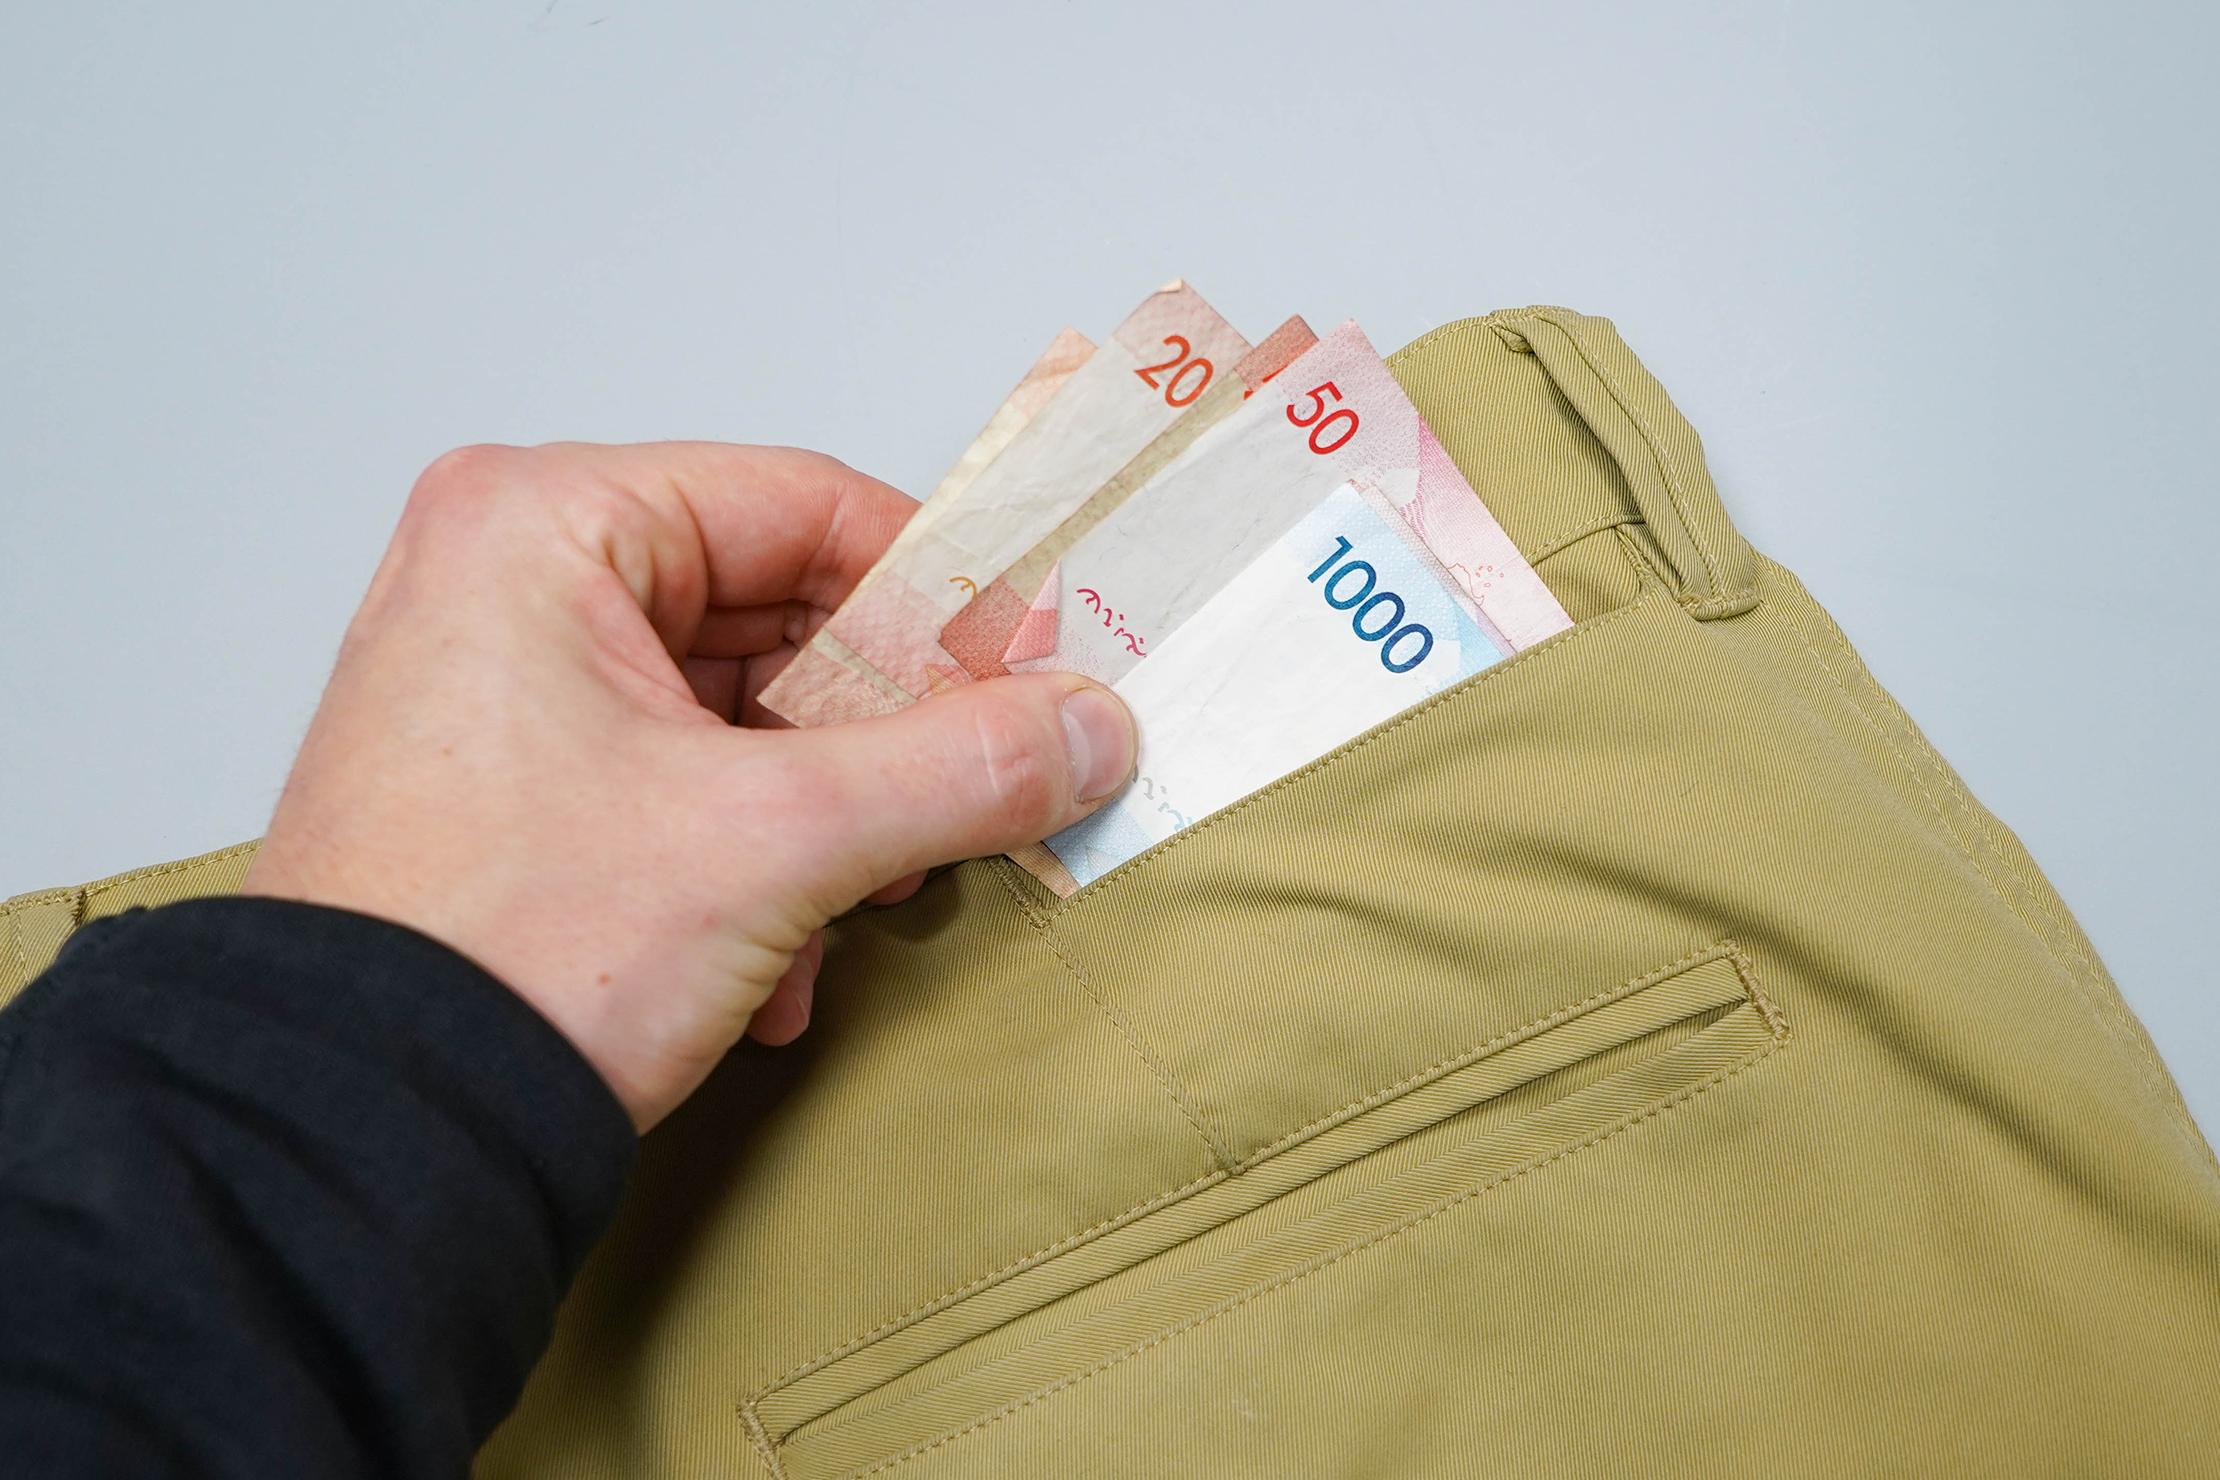 Bluffworks Ascender Chino Cash Pocket